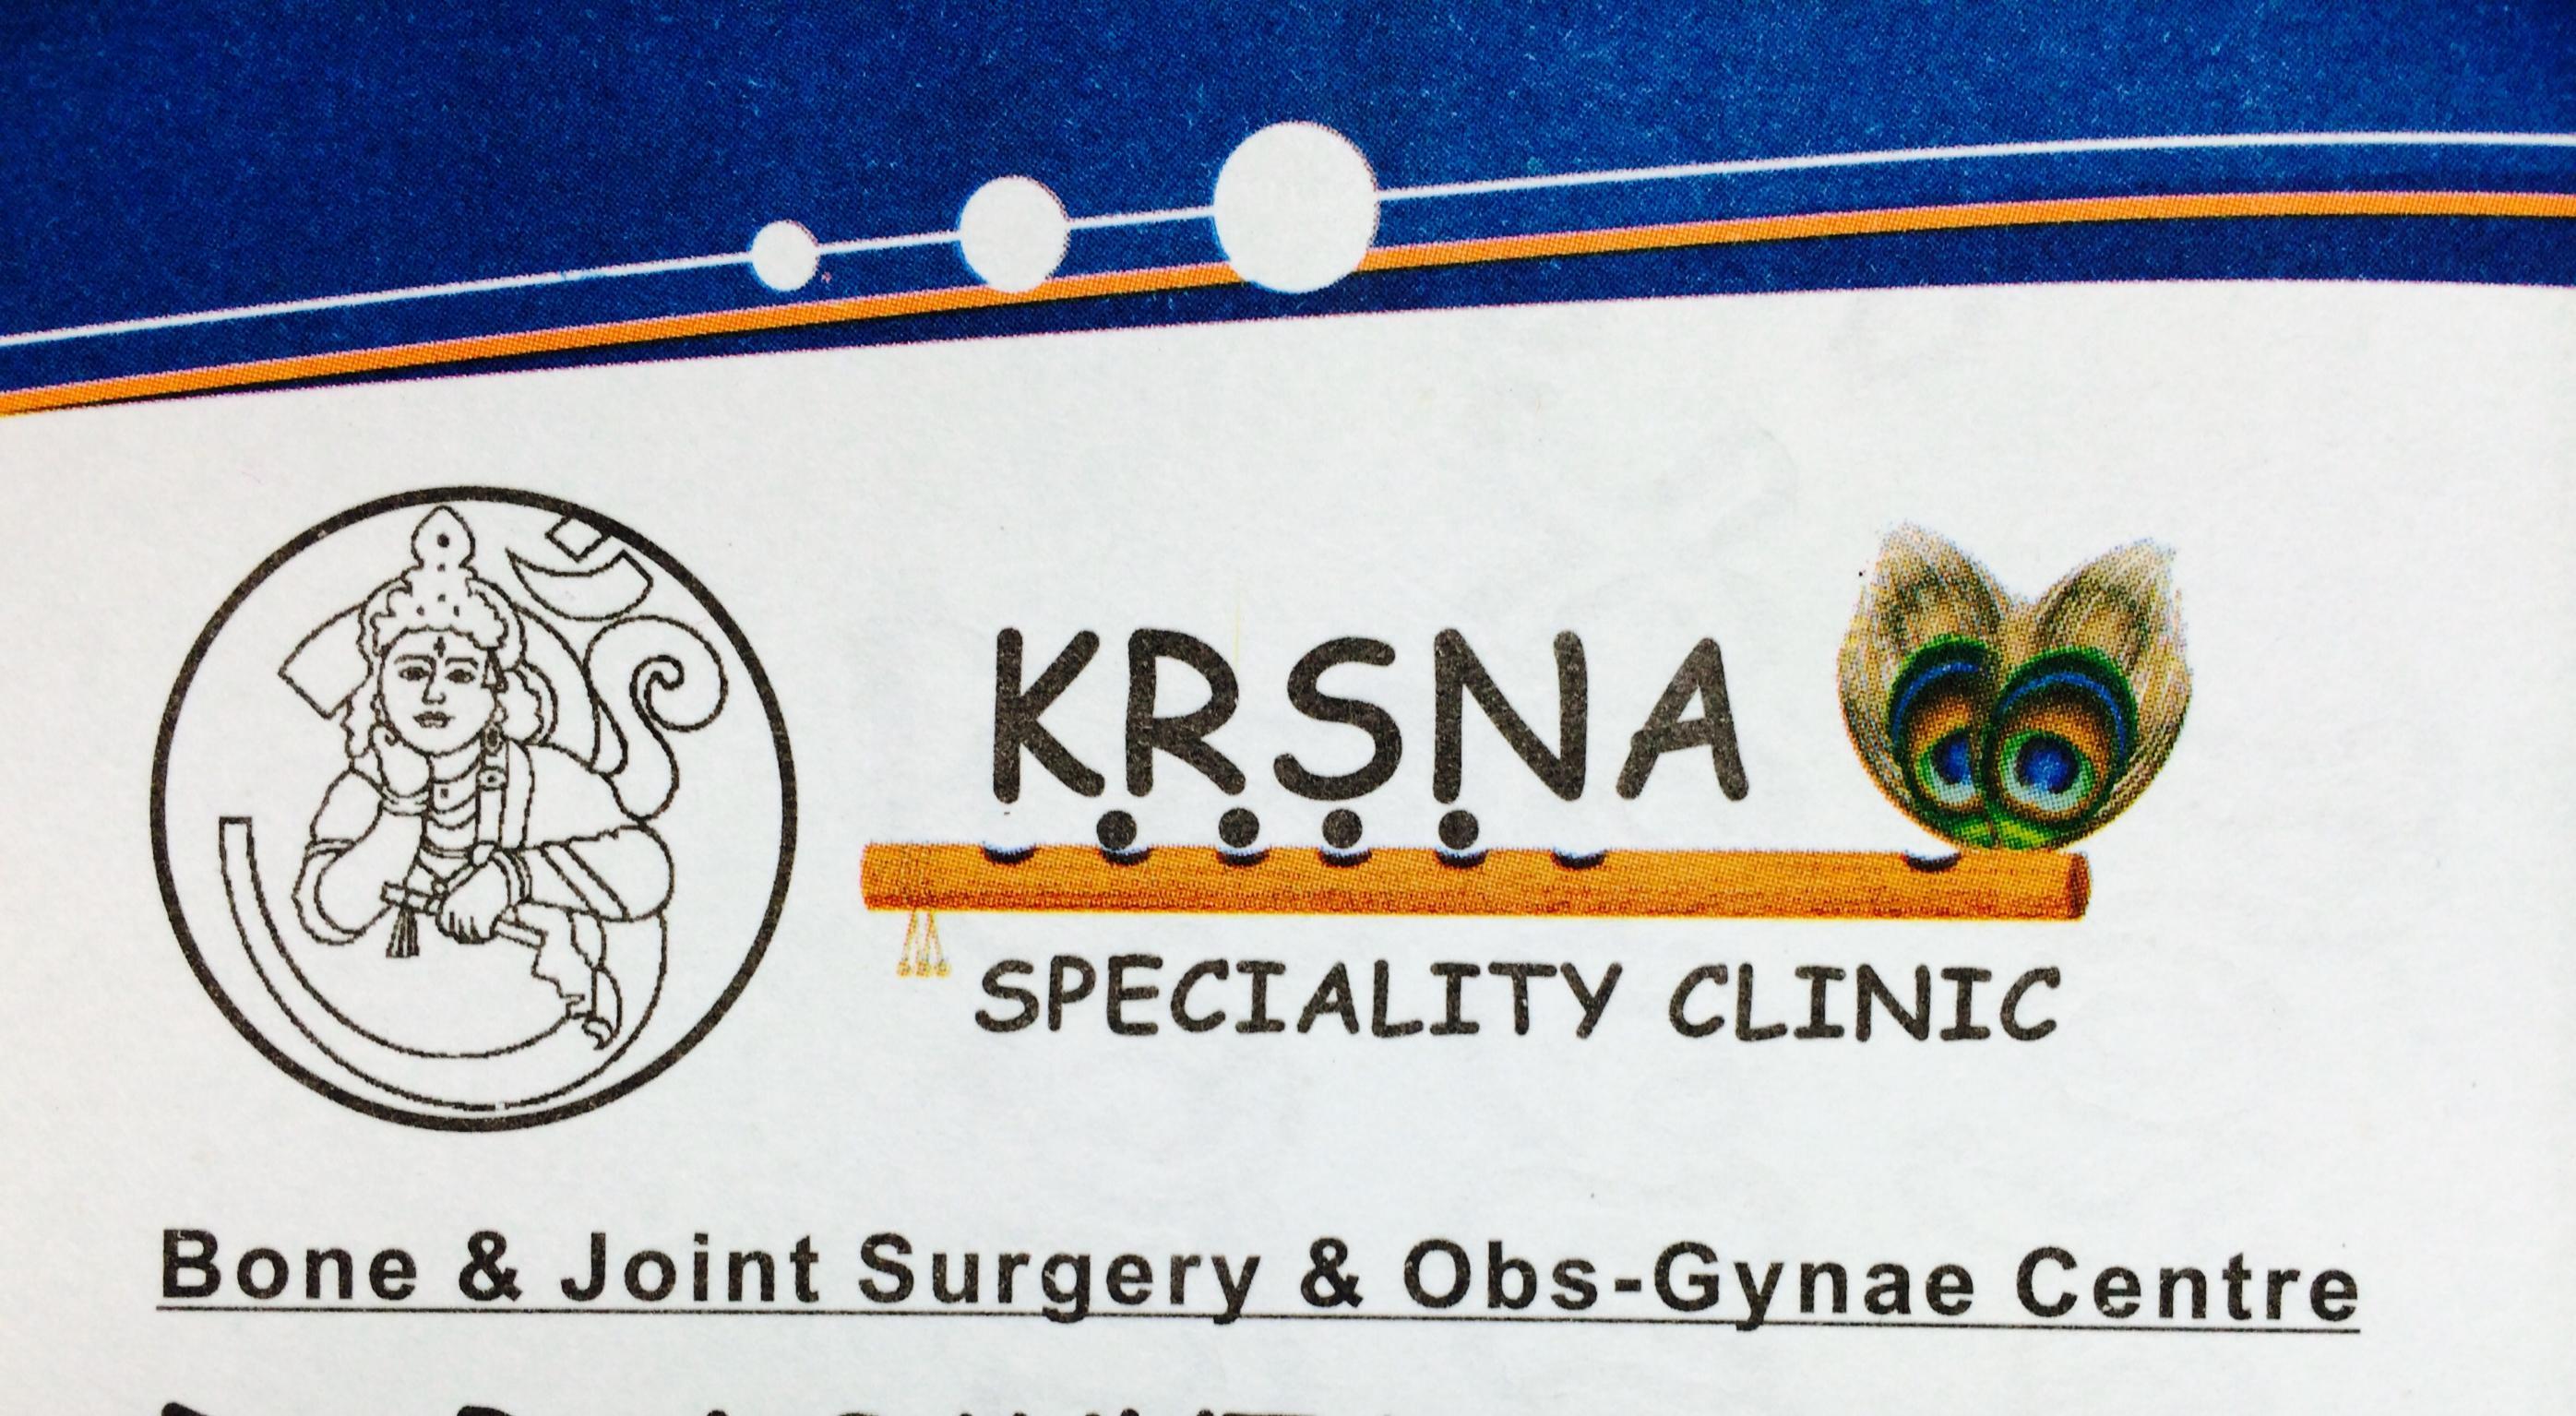 KRSNA Speciality Clinic